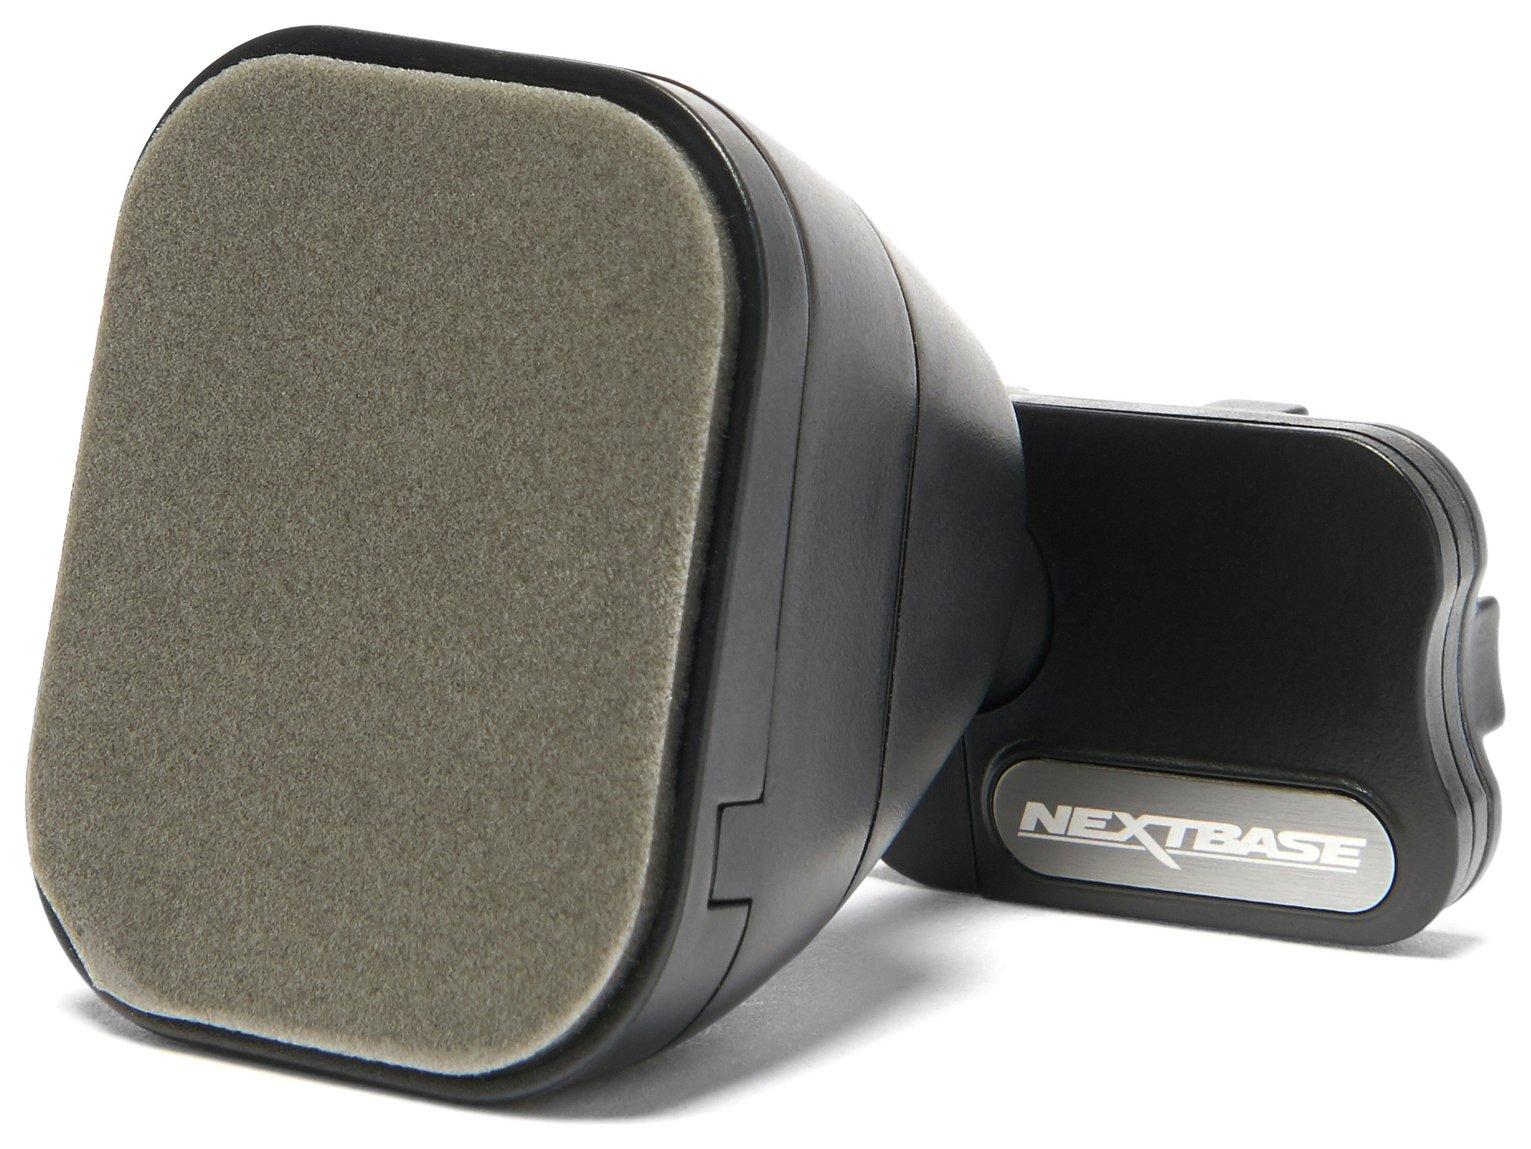 Nextbase Dash Cam Magnetic Powered Mount